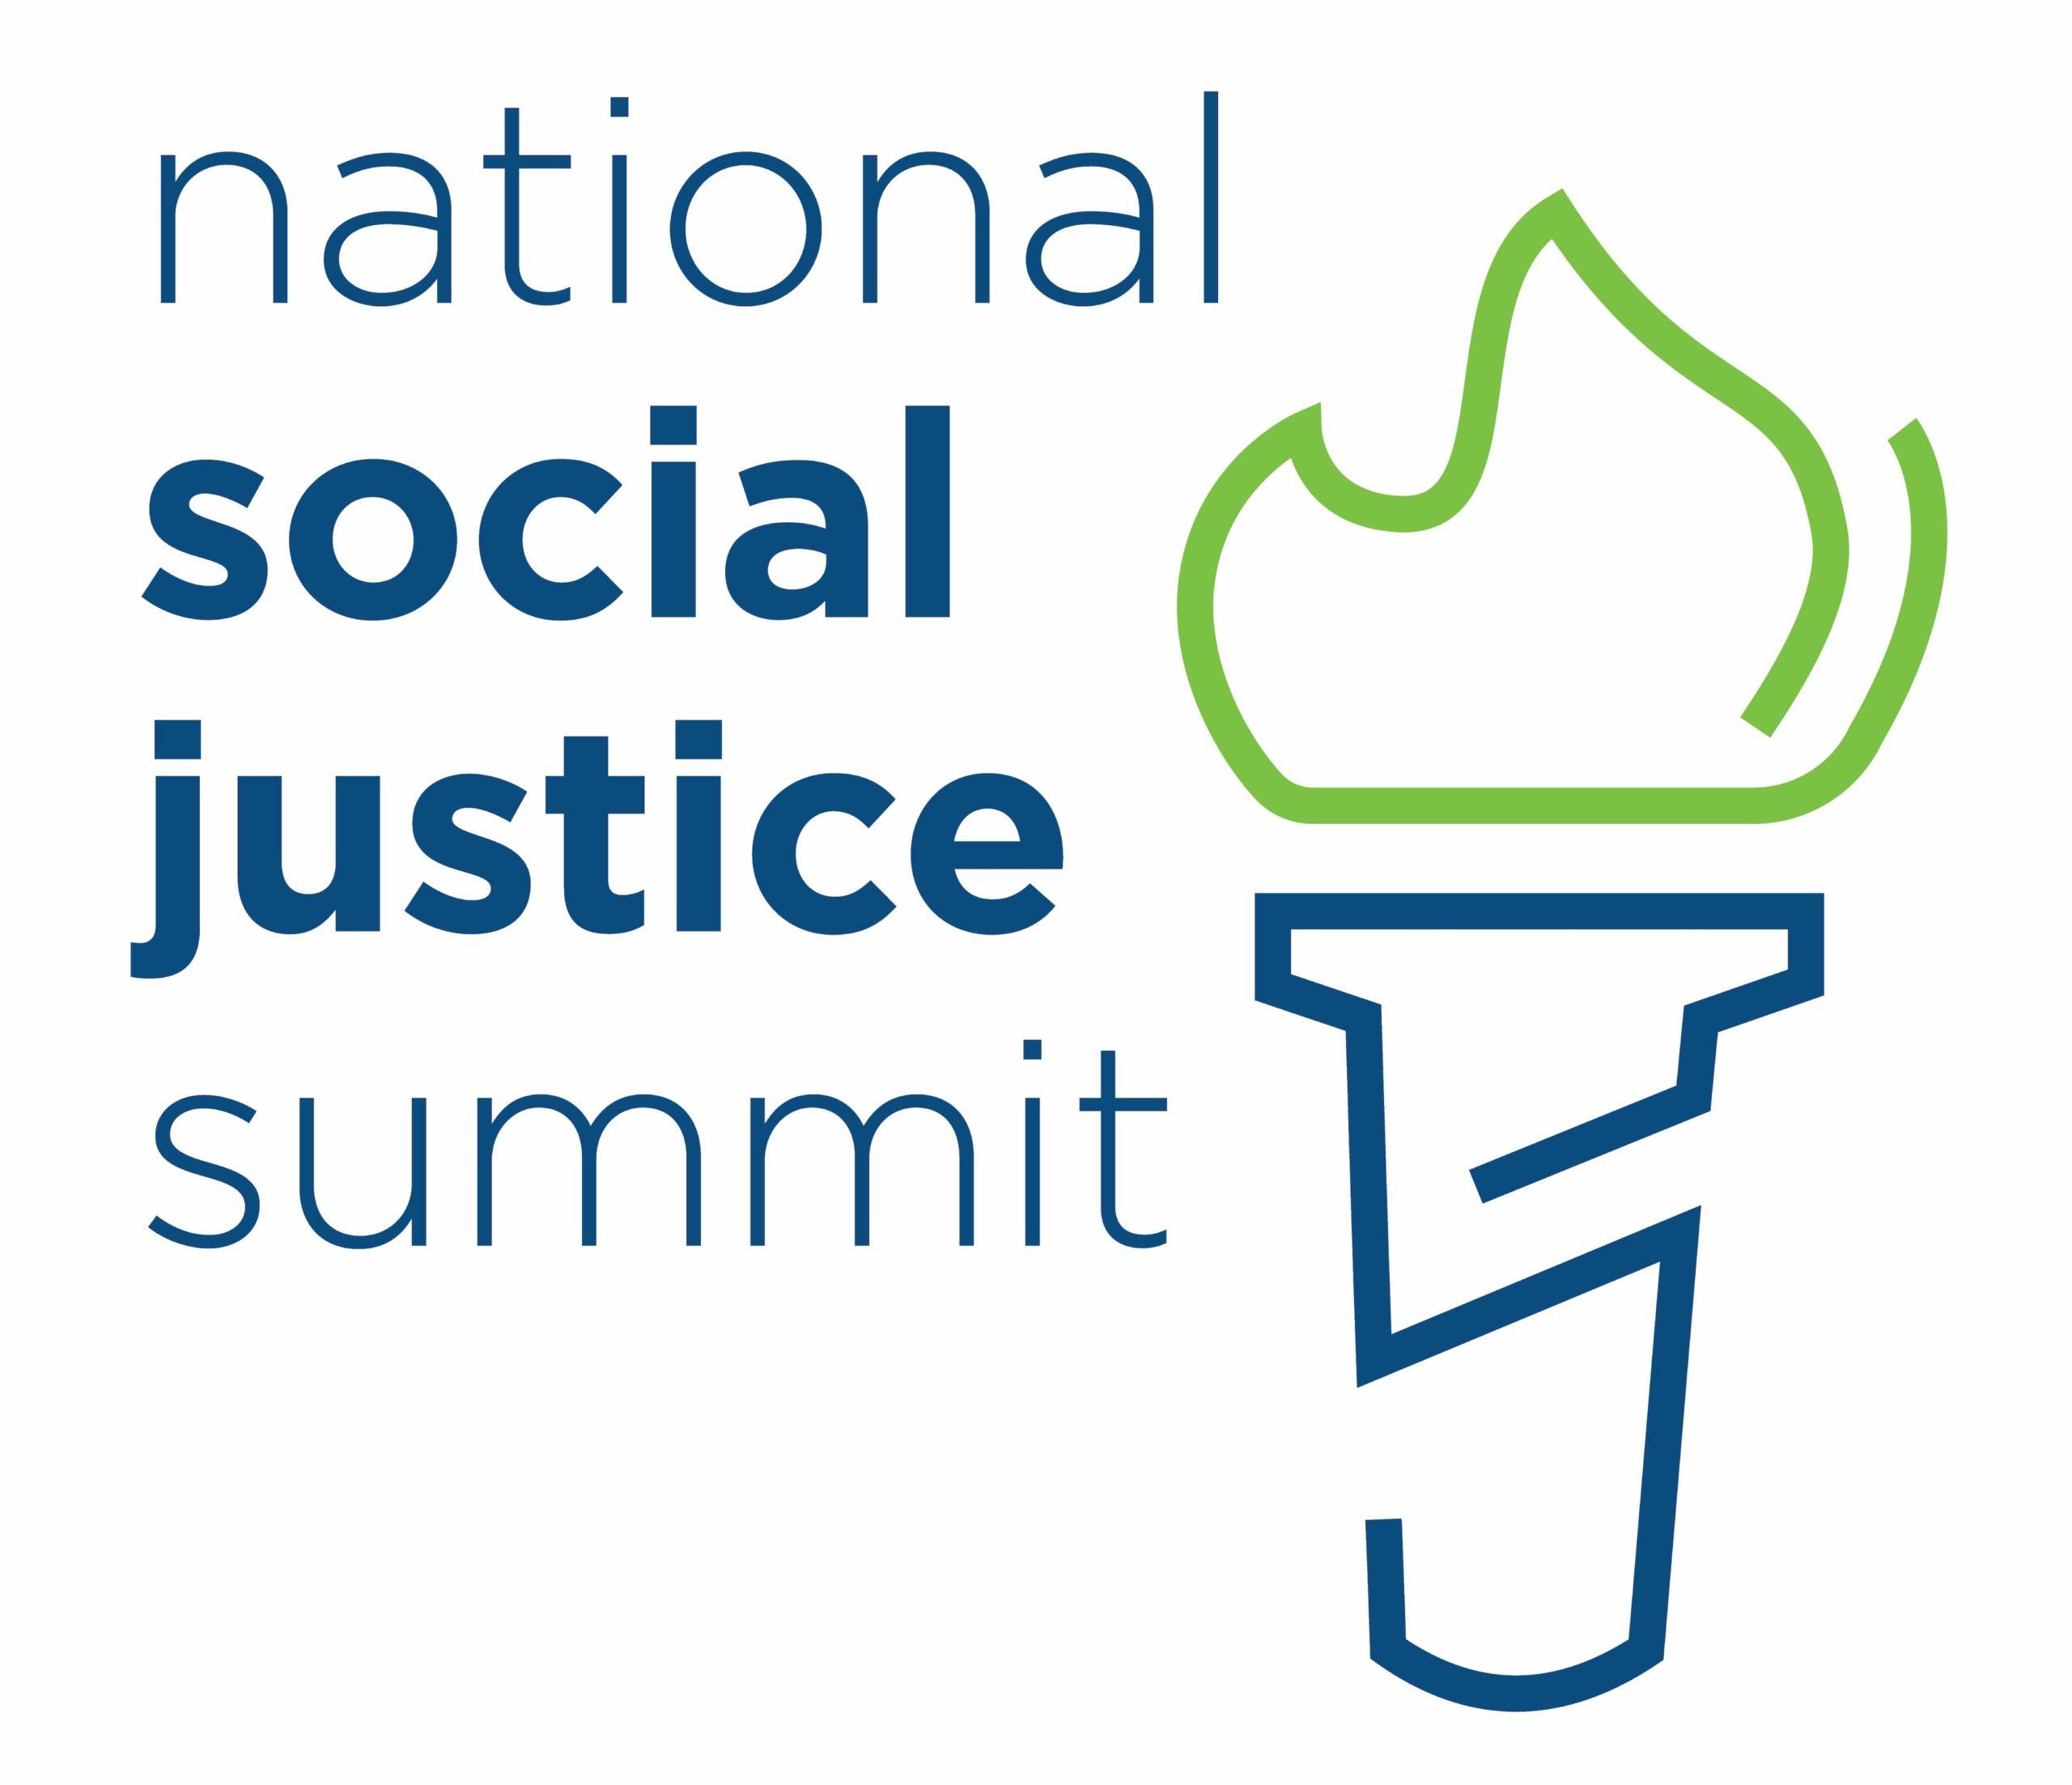 National Social Justice Summit Logo